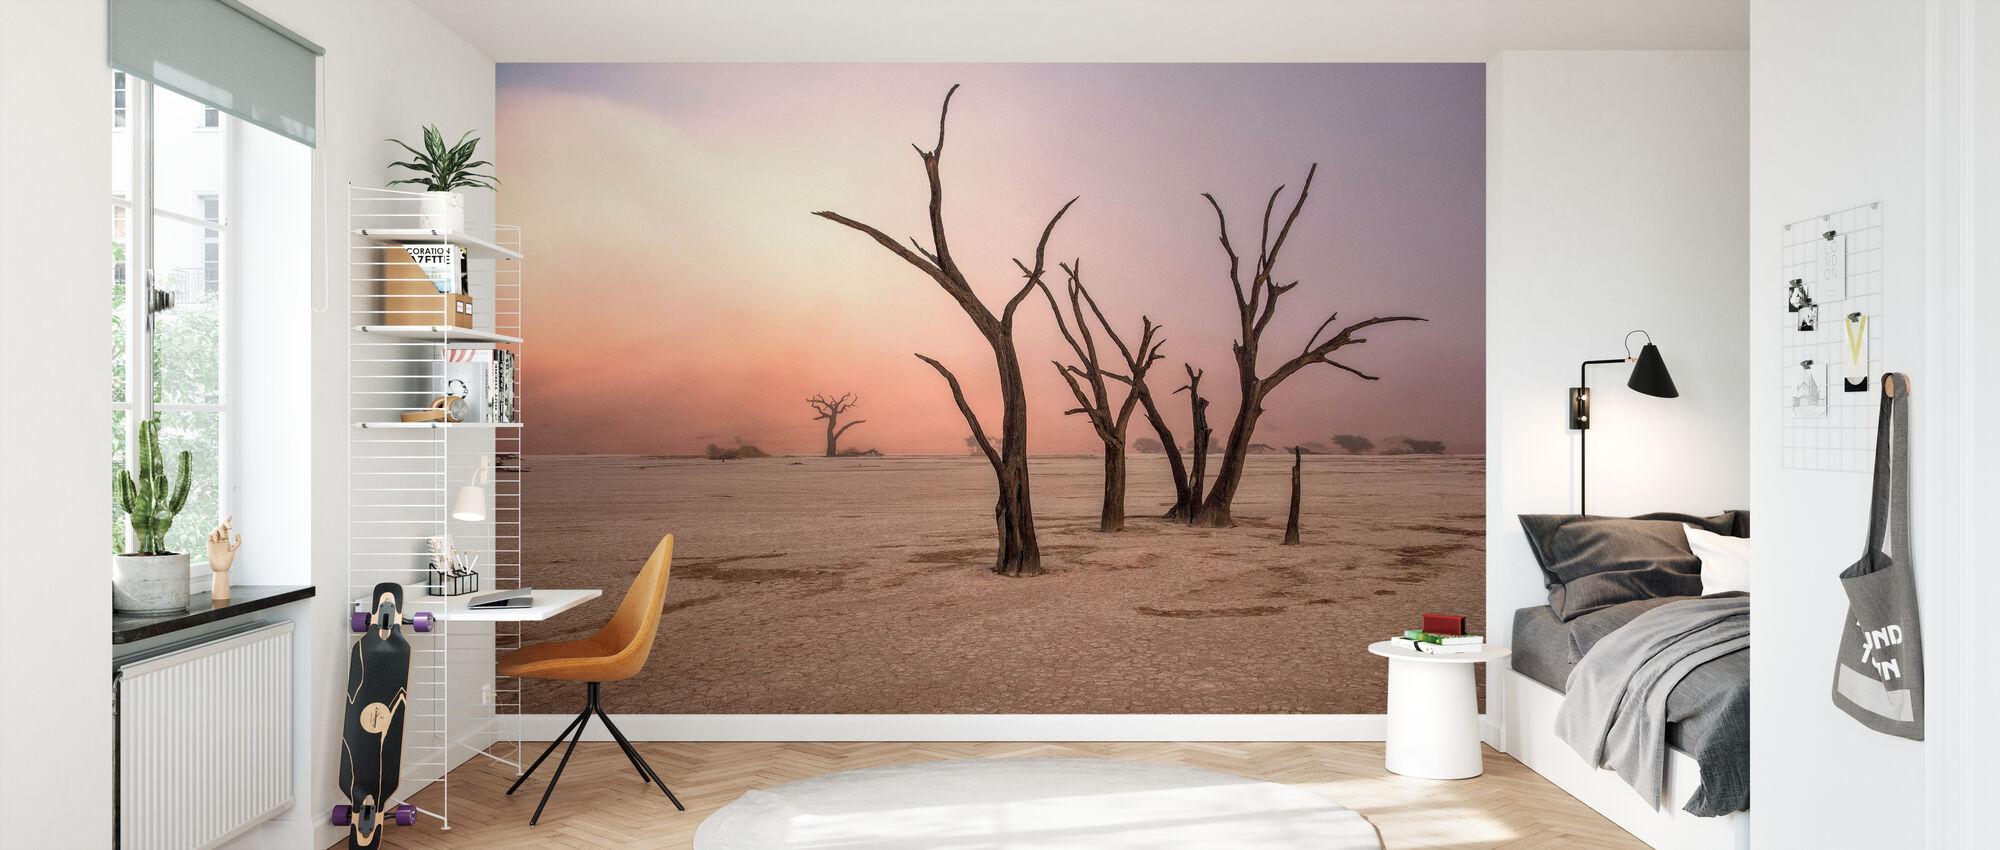 Fog in Deadvlei - Wallpaper - Kids Room